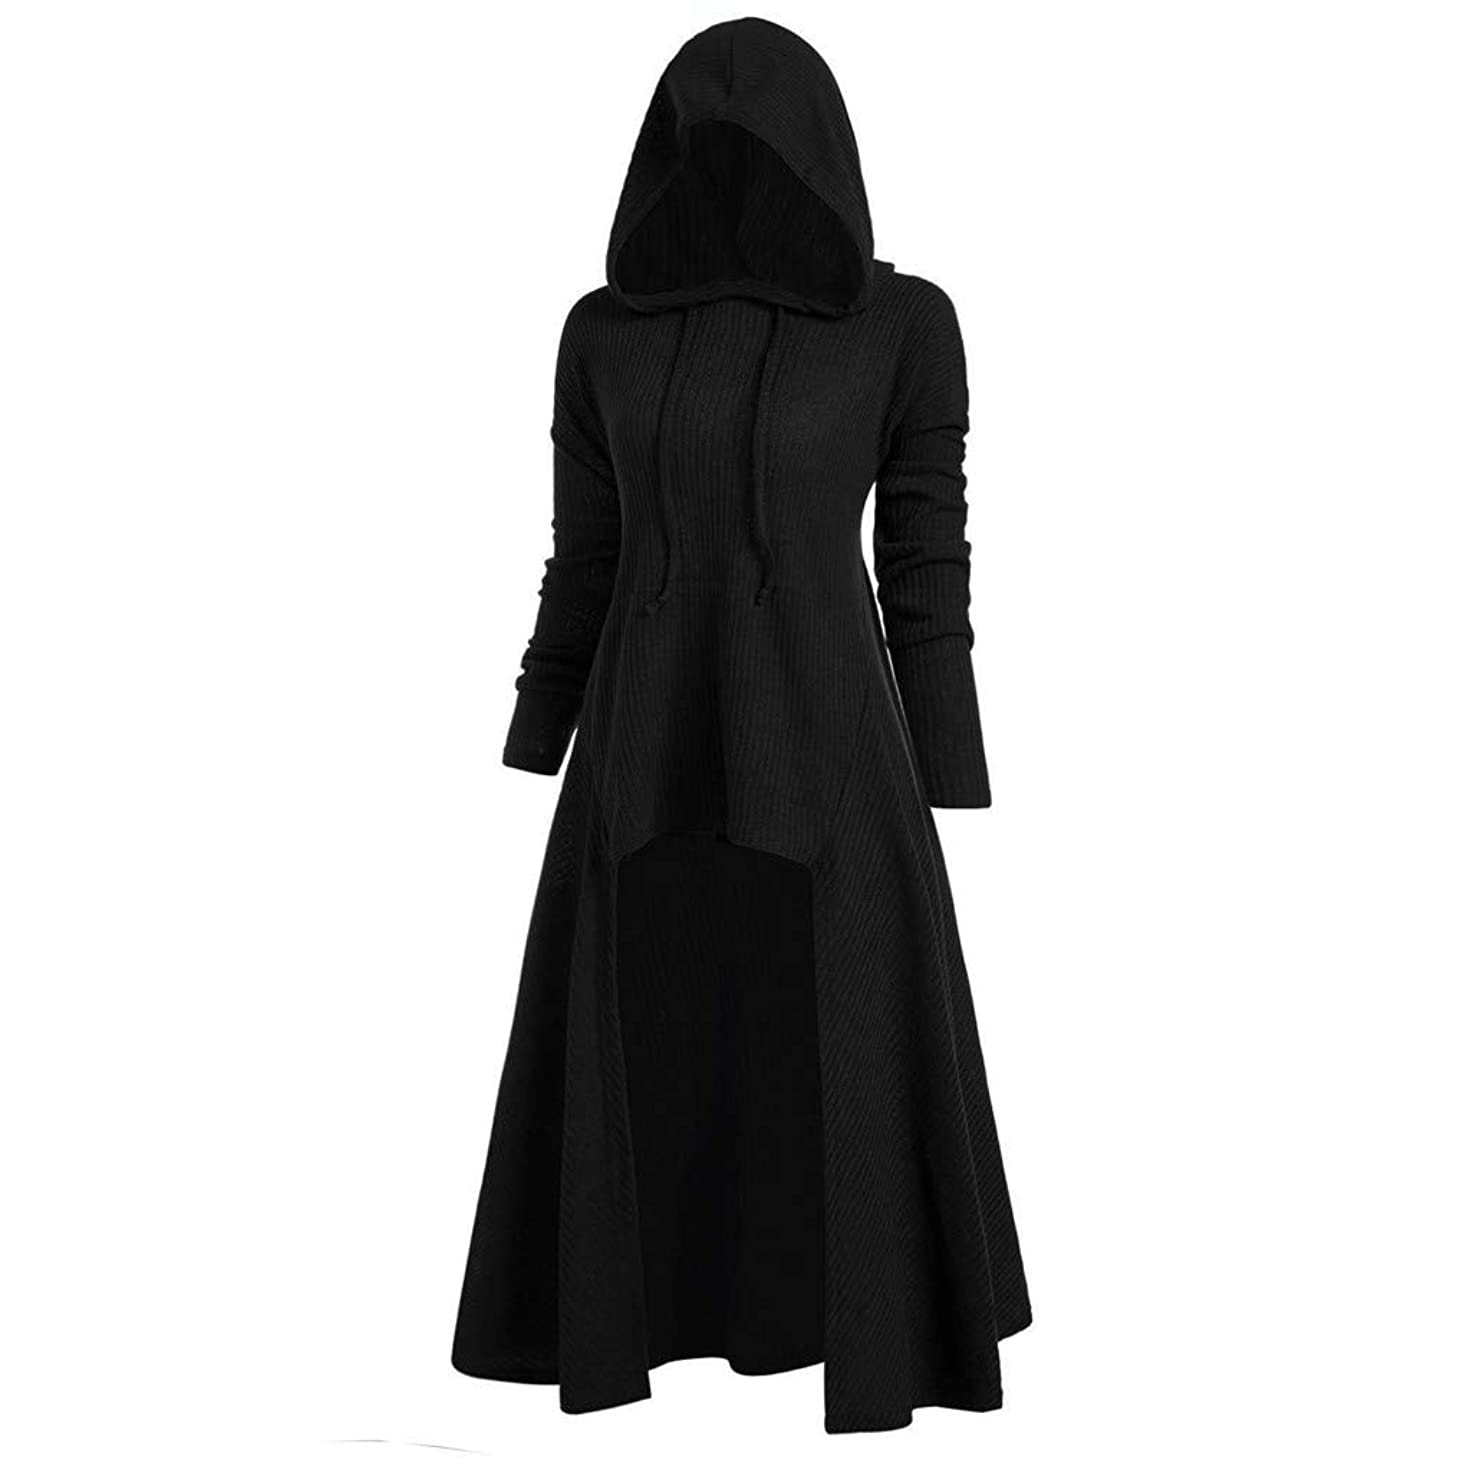 Womens Gothic Punk Asymmetric Hem Long Sleeve Loose Hoodies Dress Cloak Costumes Vintage High Low Sweatshirts Tunic Tops